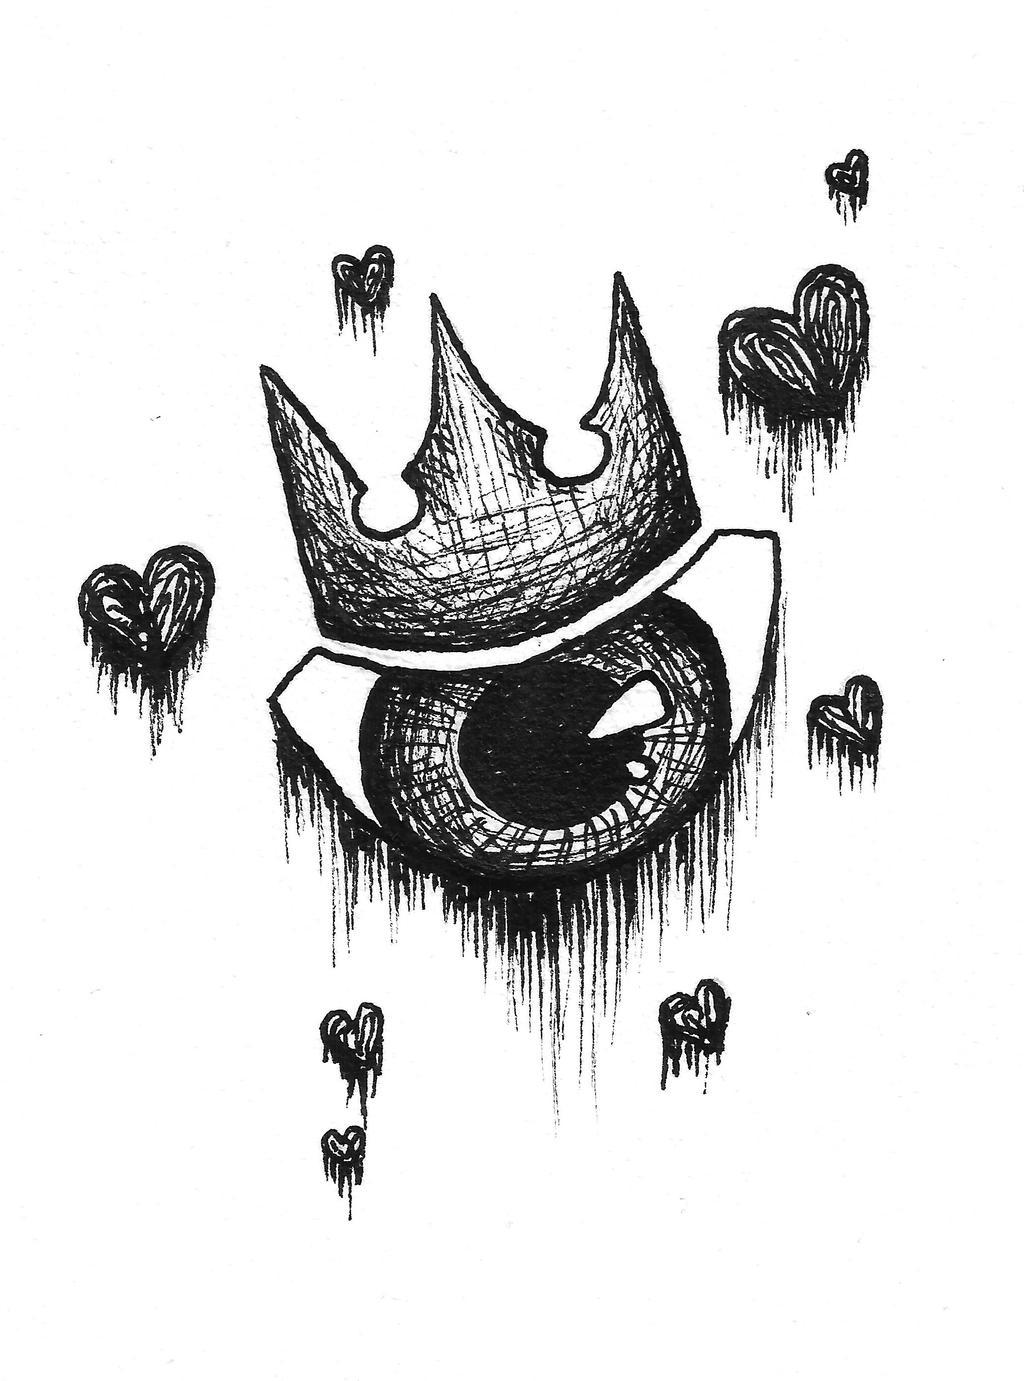 King of Hearts by Fallmusic